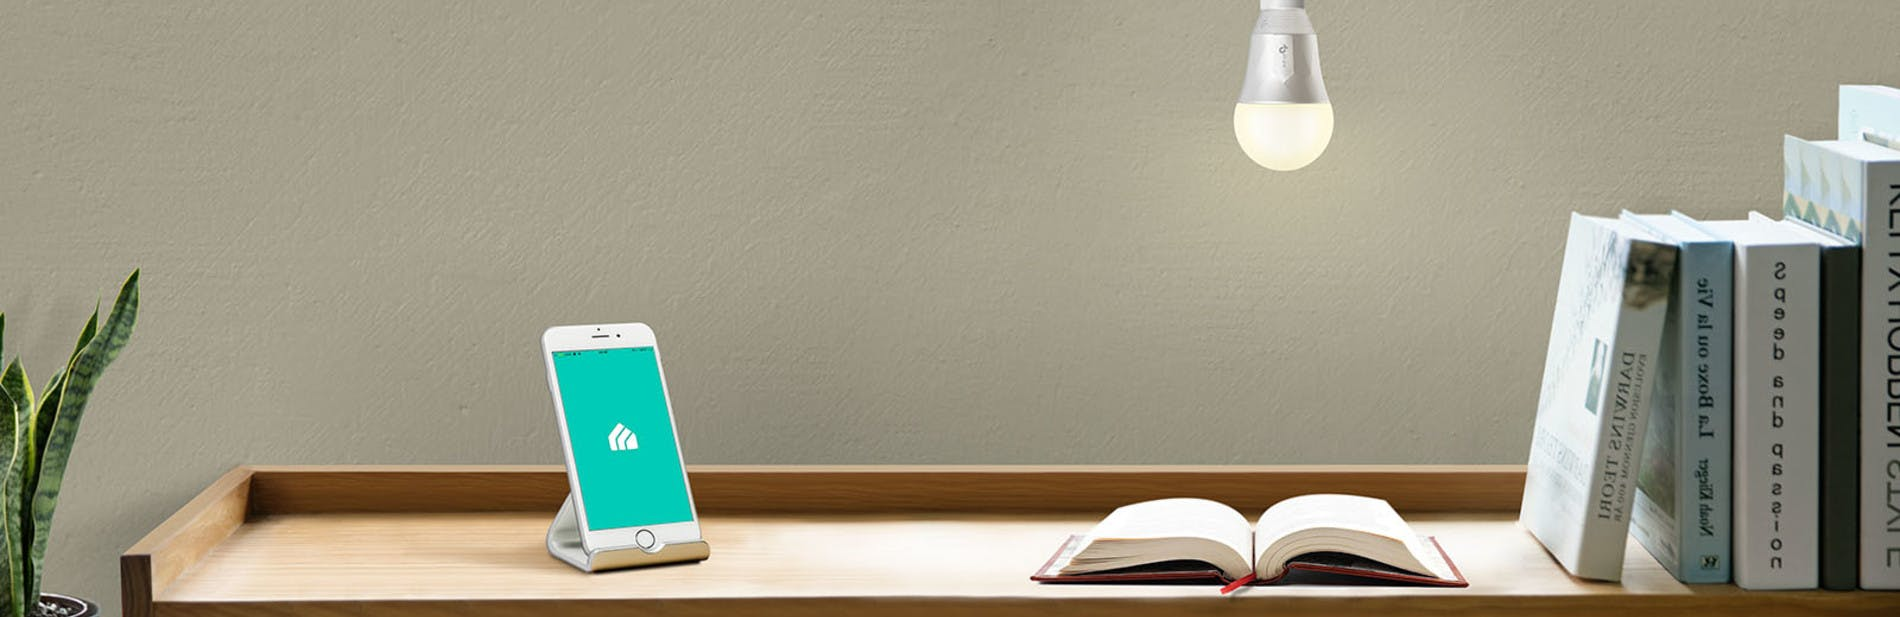 Kasa Smart Light Bulb Dimmable Product Banner